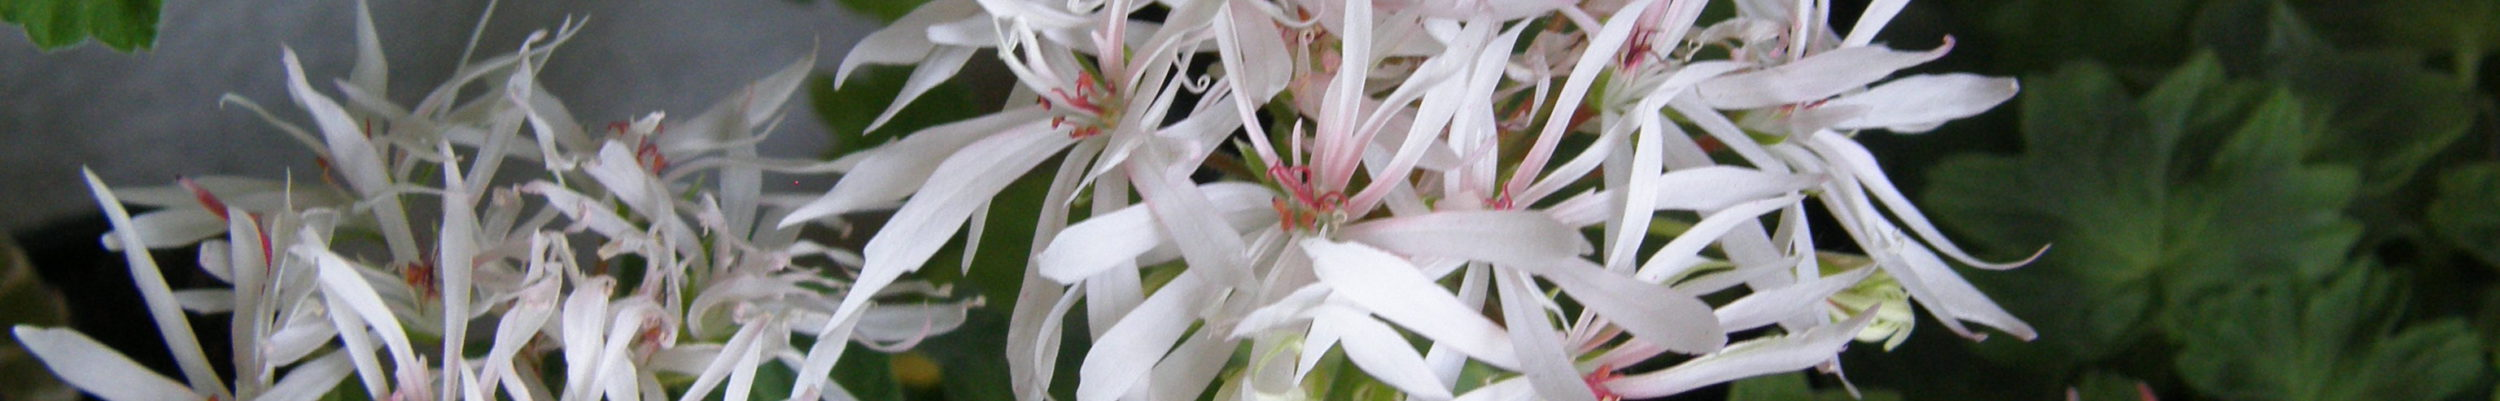 Белый цветок.Уфа